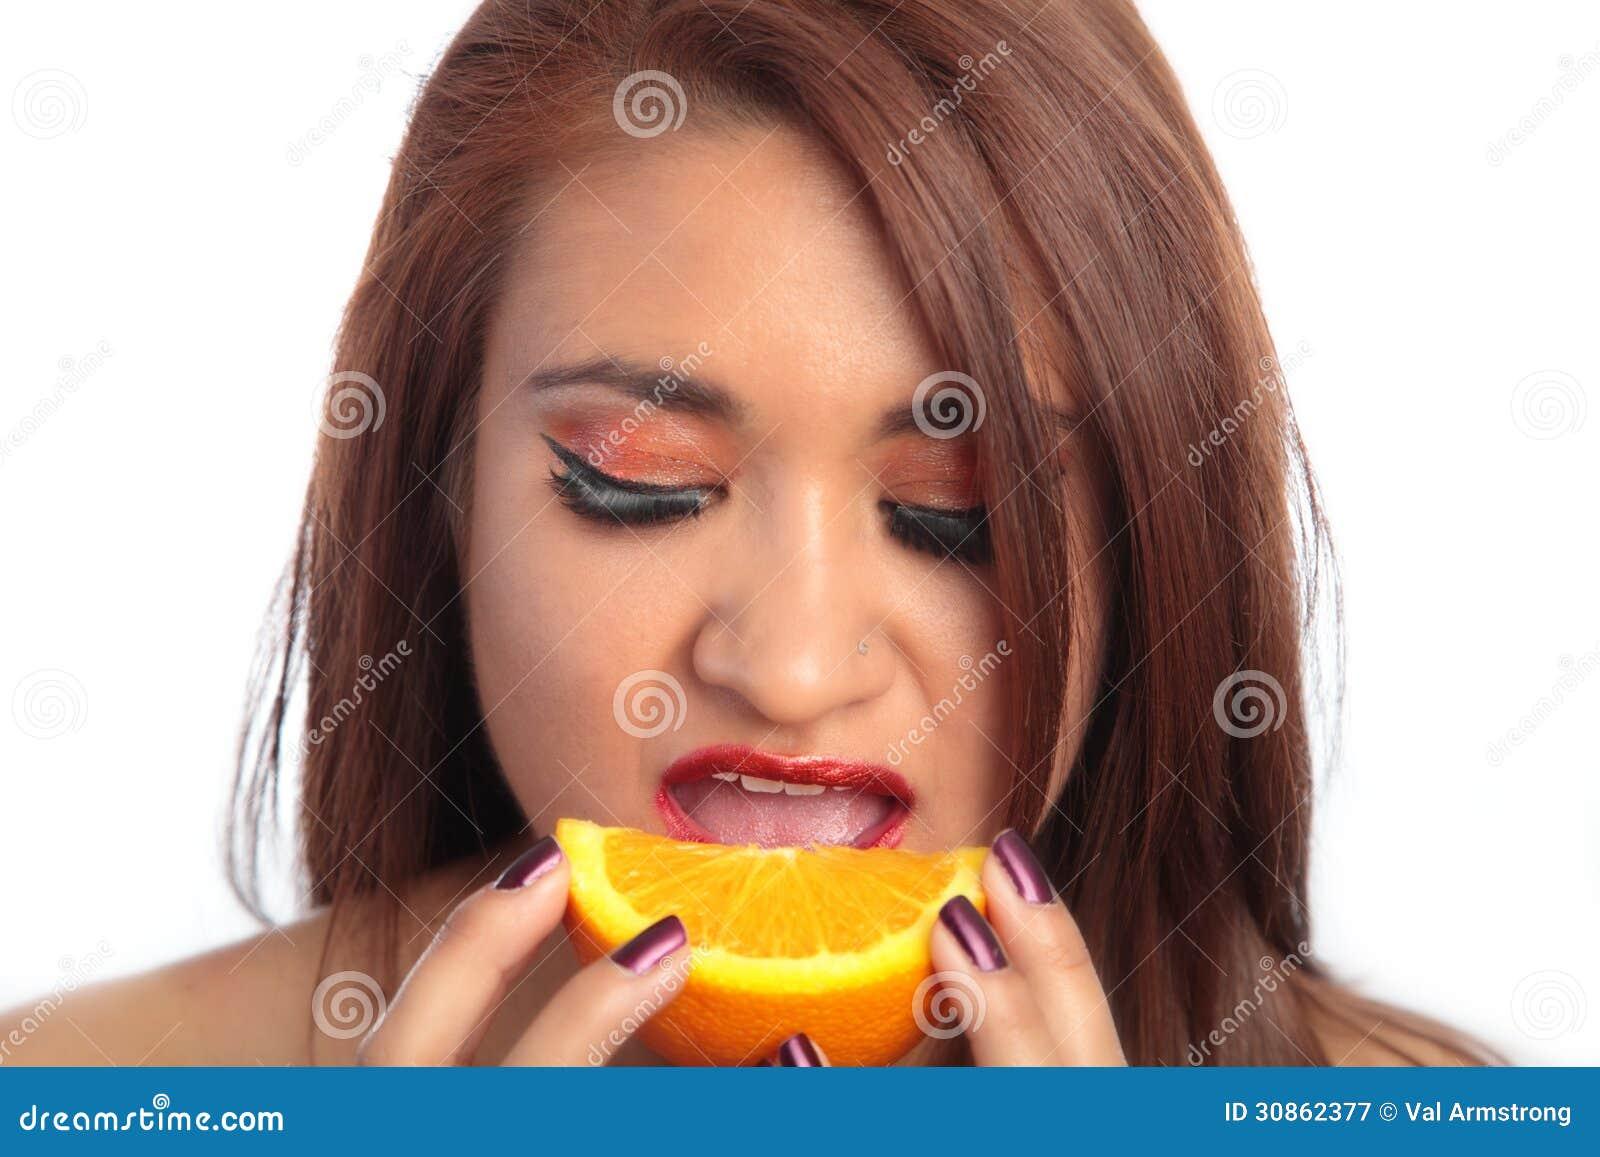 latina girls eating pussy